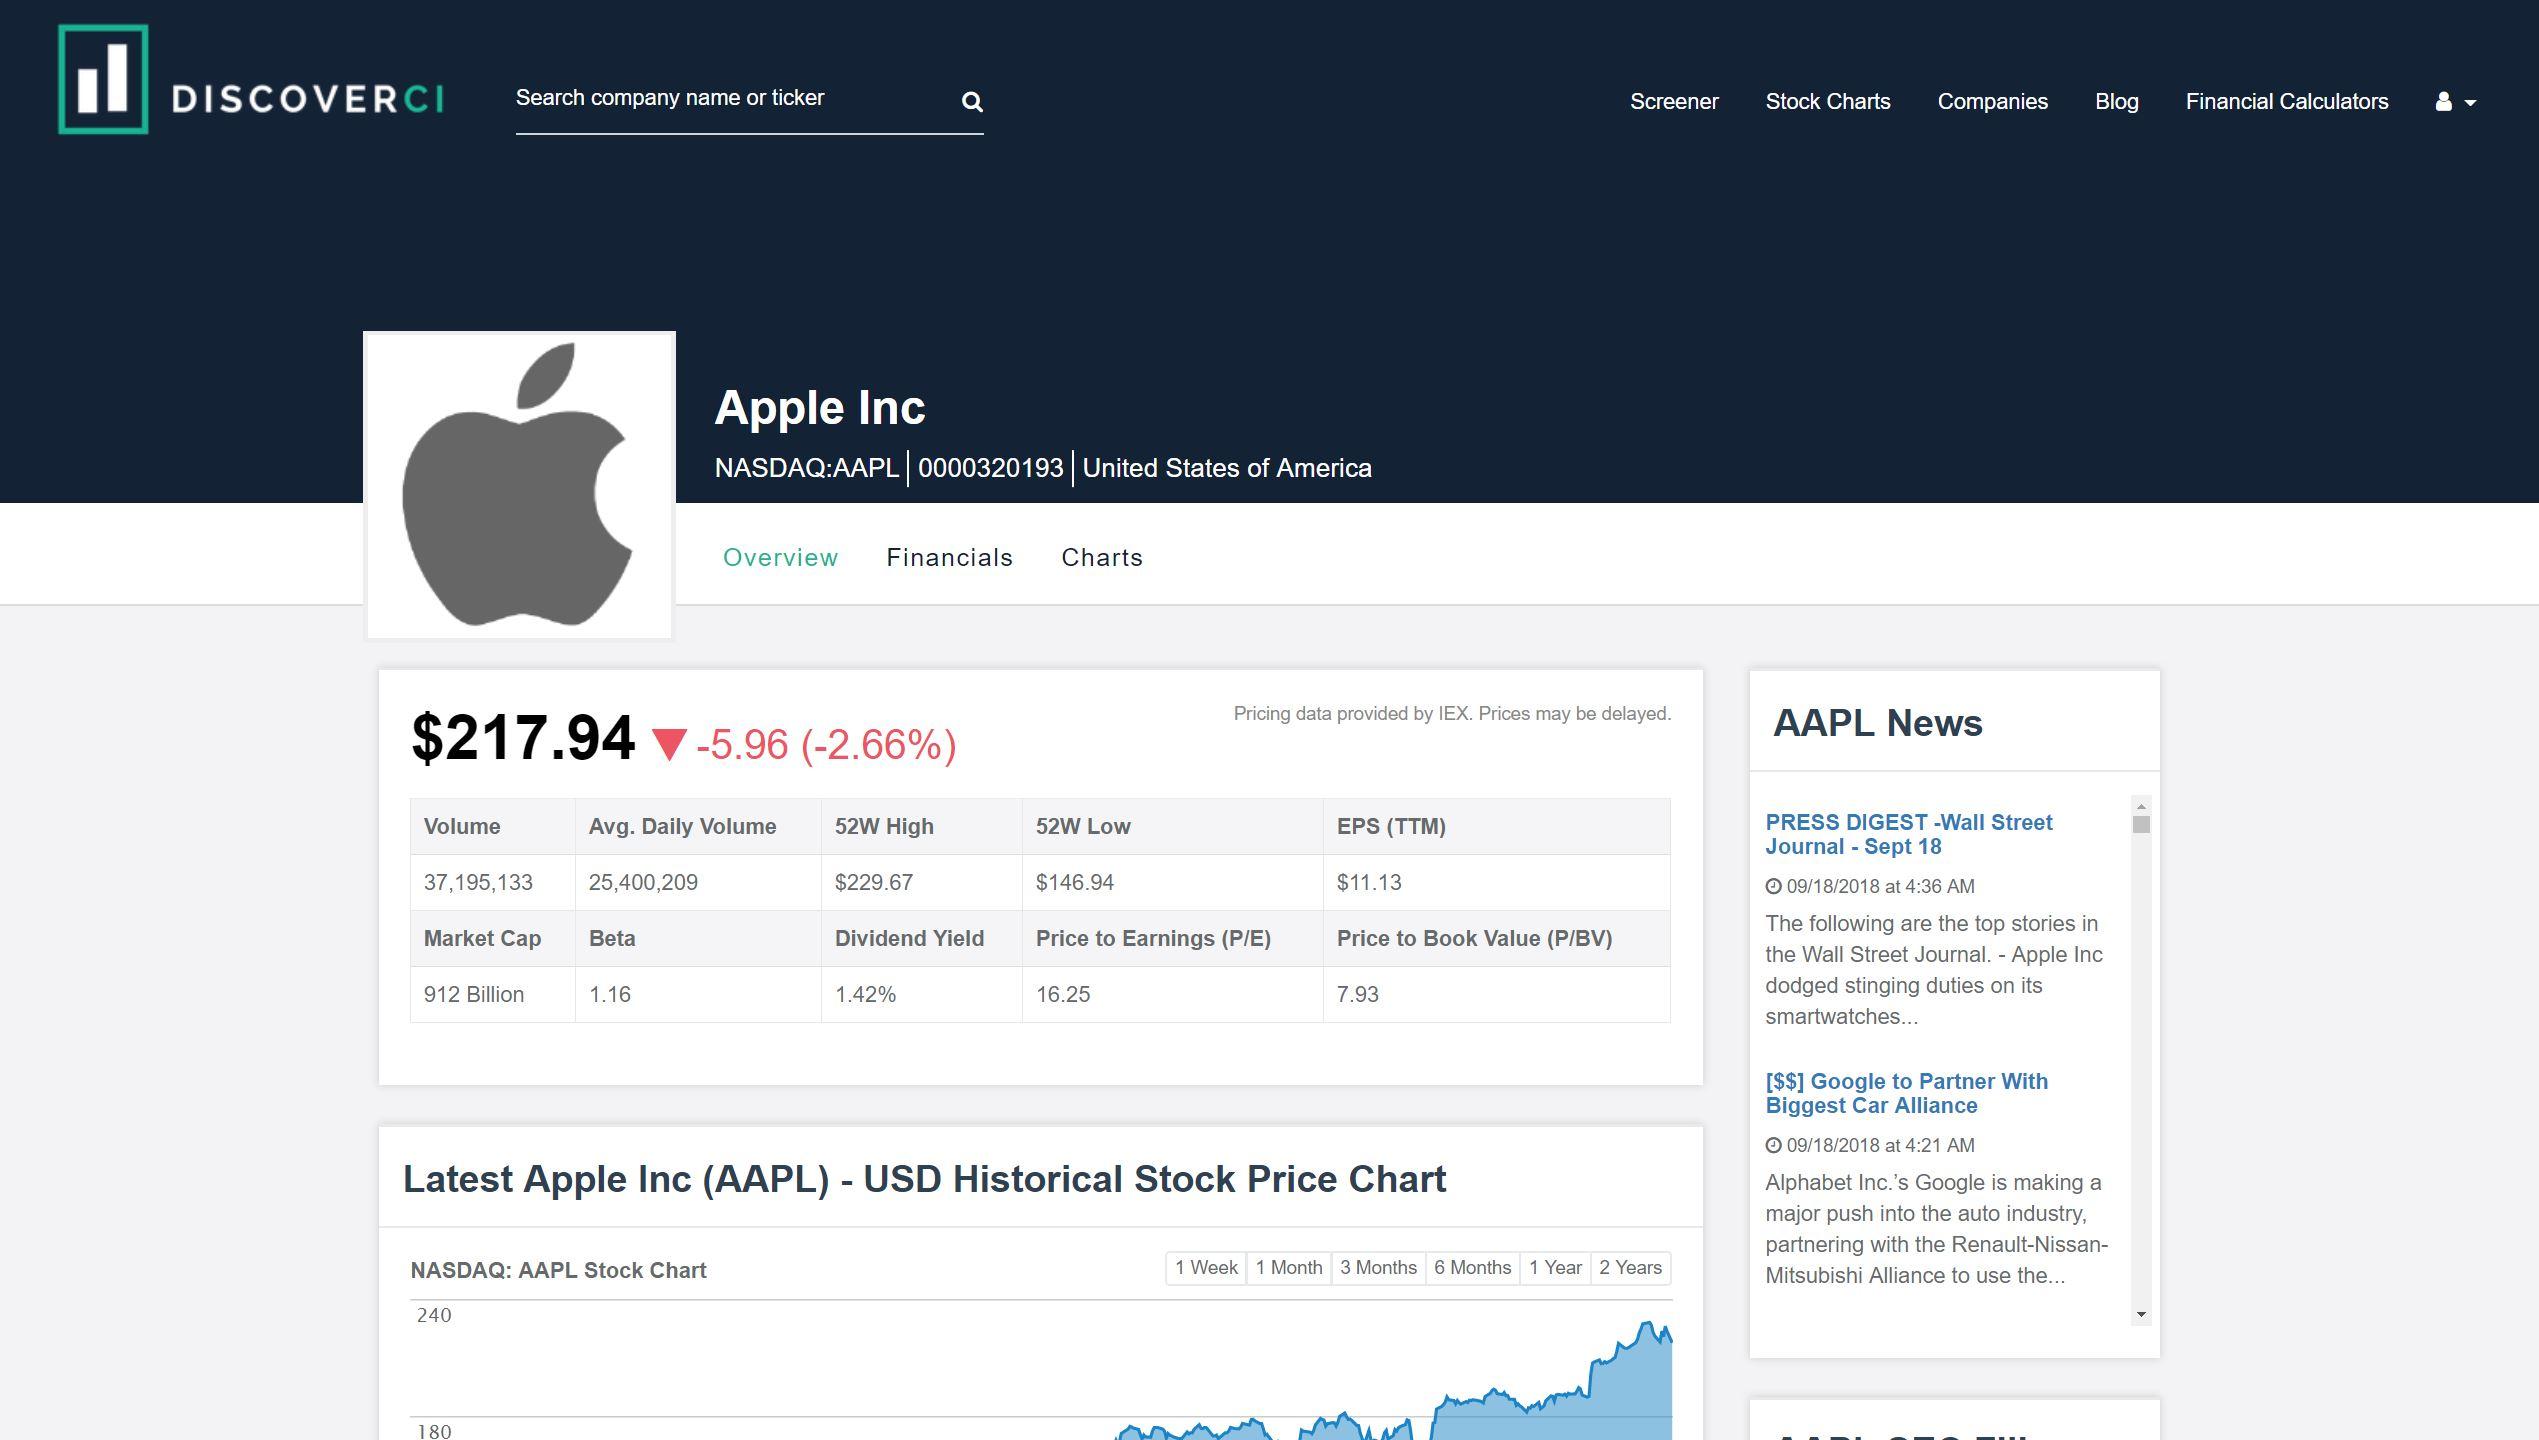 AAPL Company Profile - DiscoverCI.com